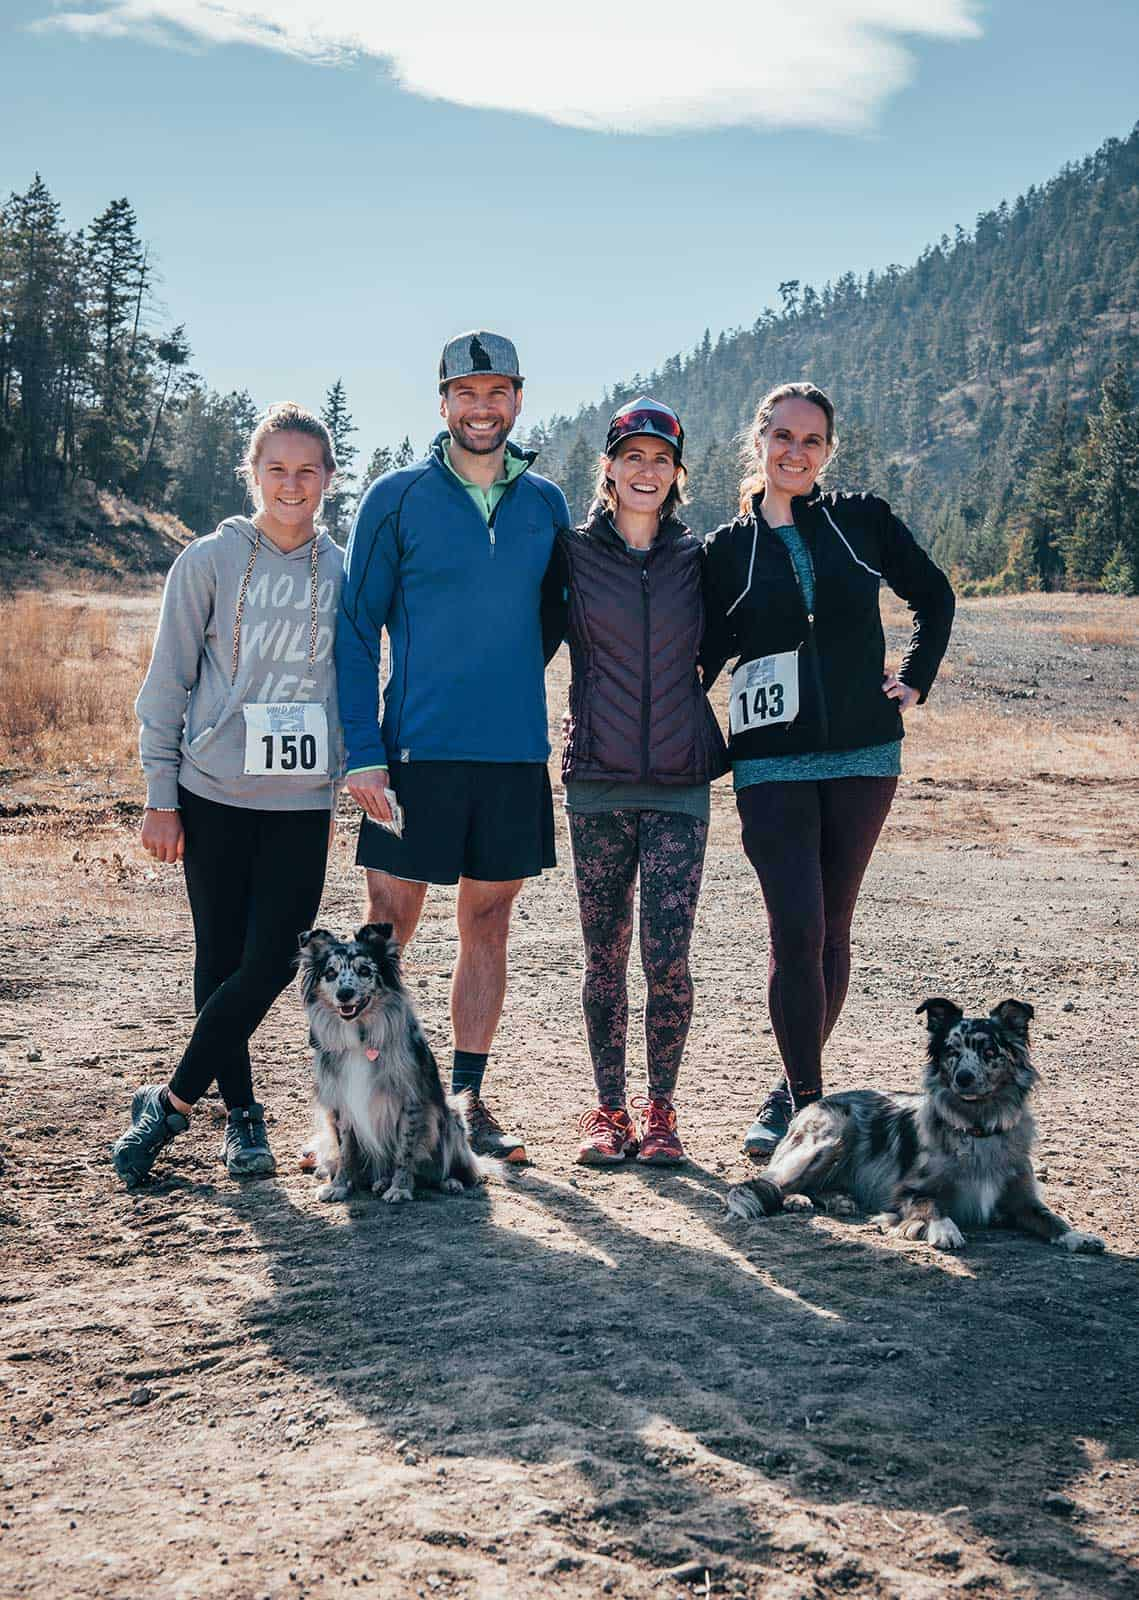 2018 Wild One Run Event Organizers